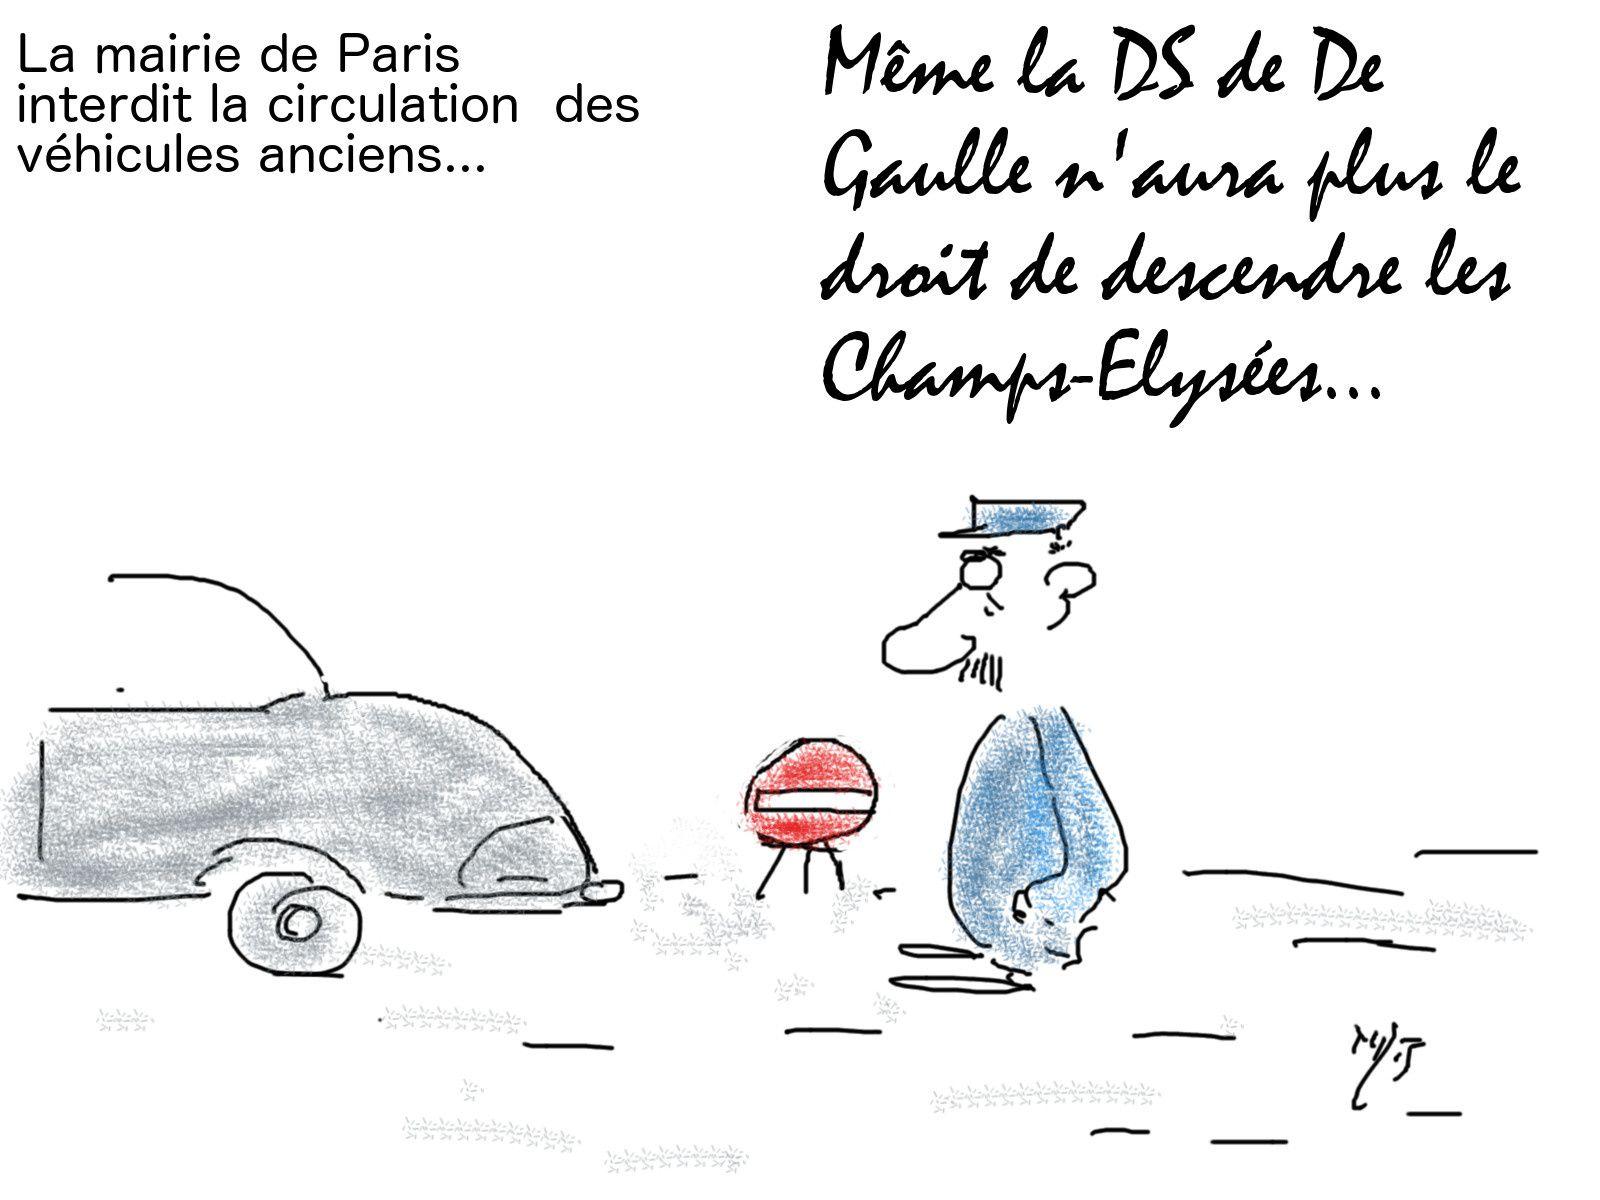 Inerdire vieilles voitures à Paris